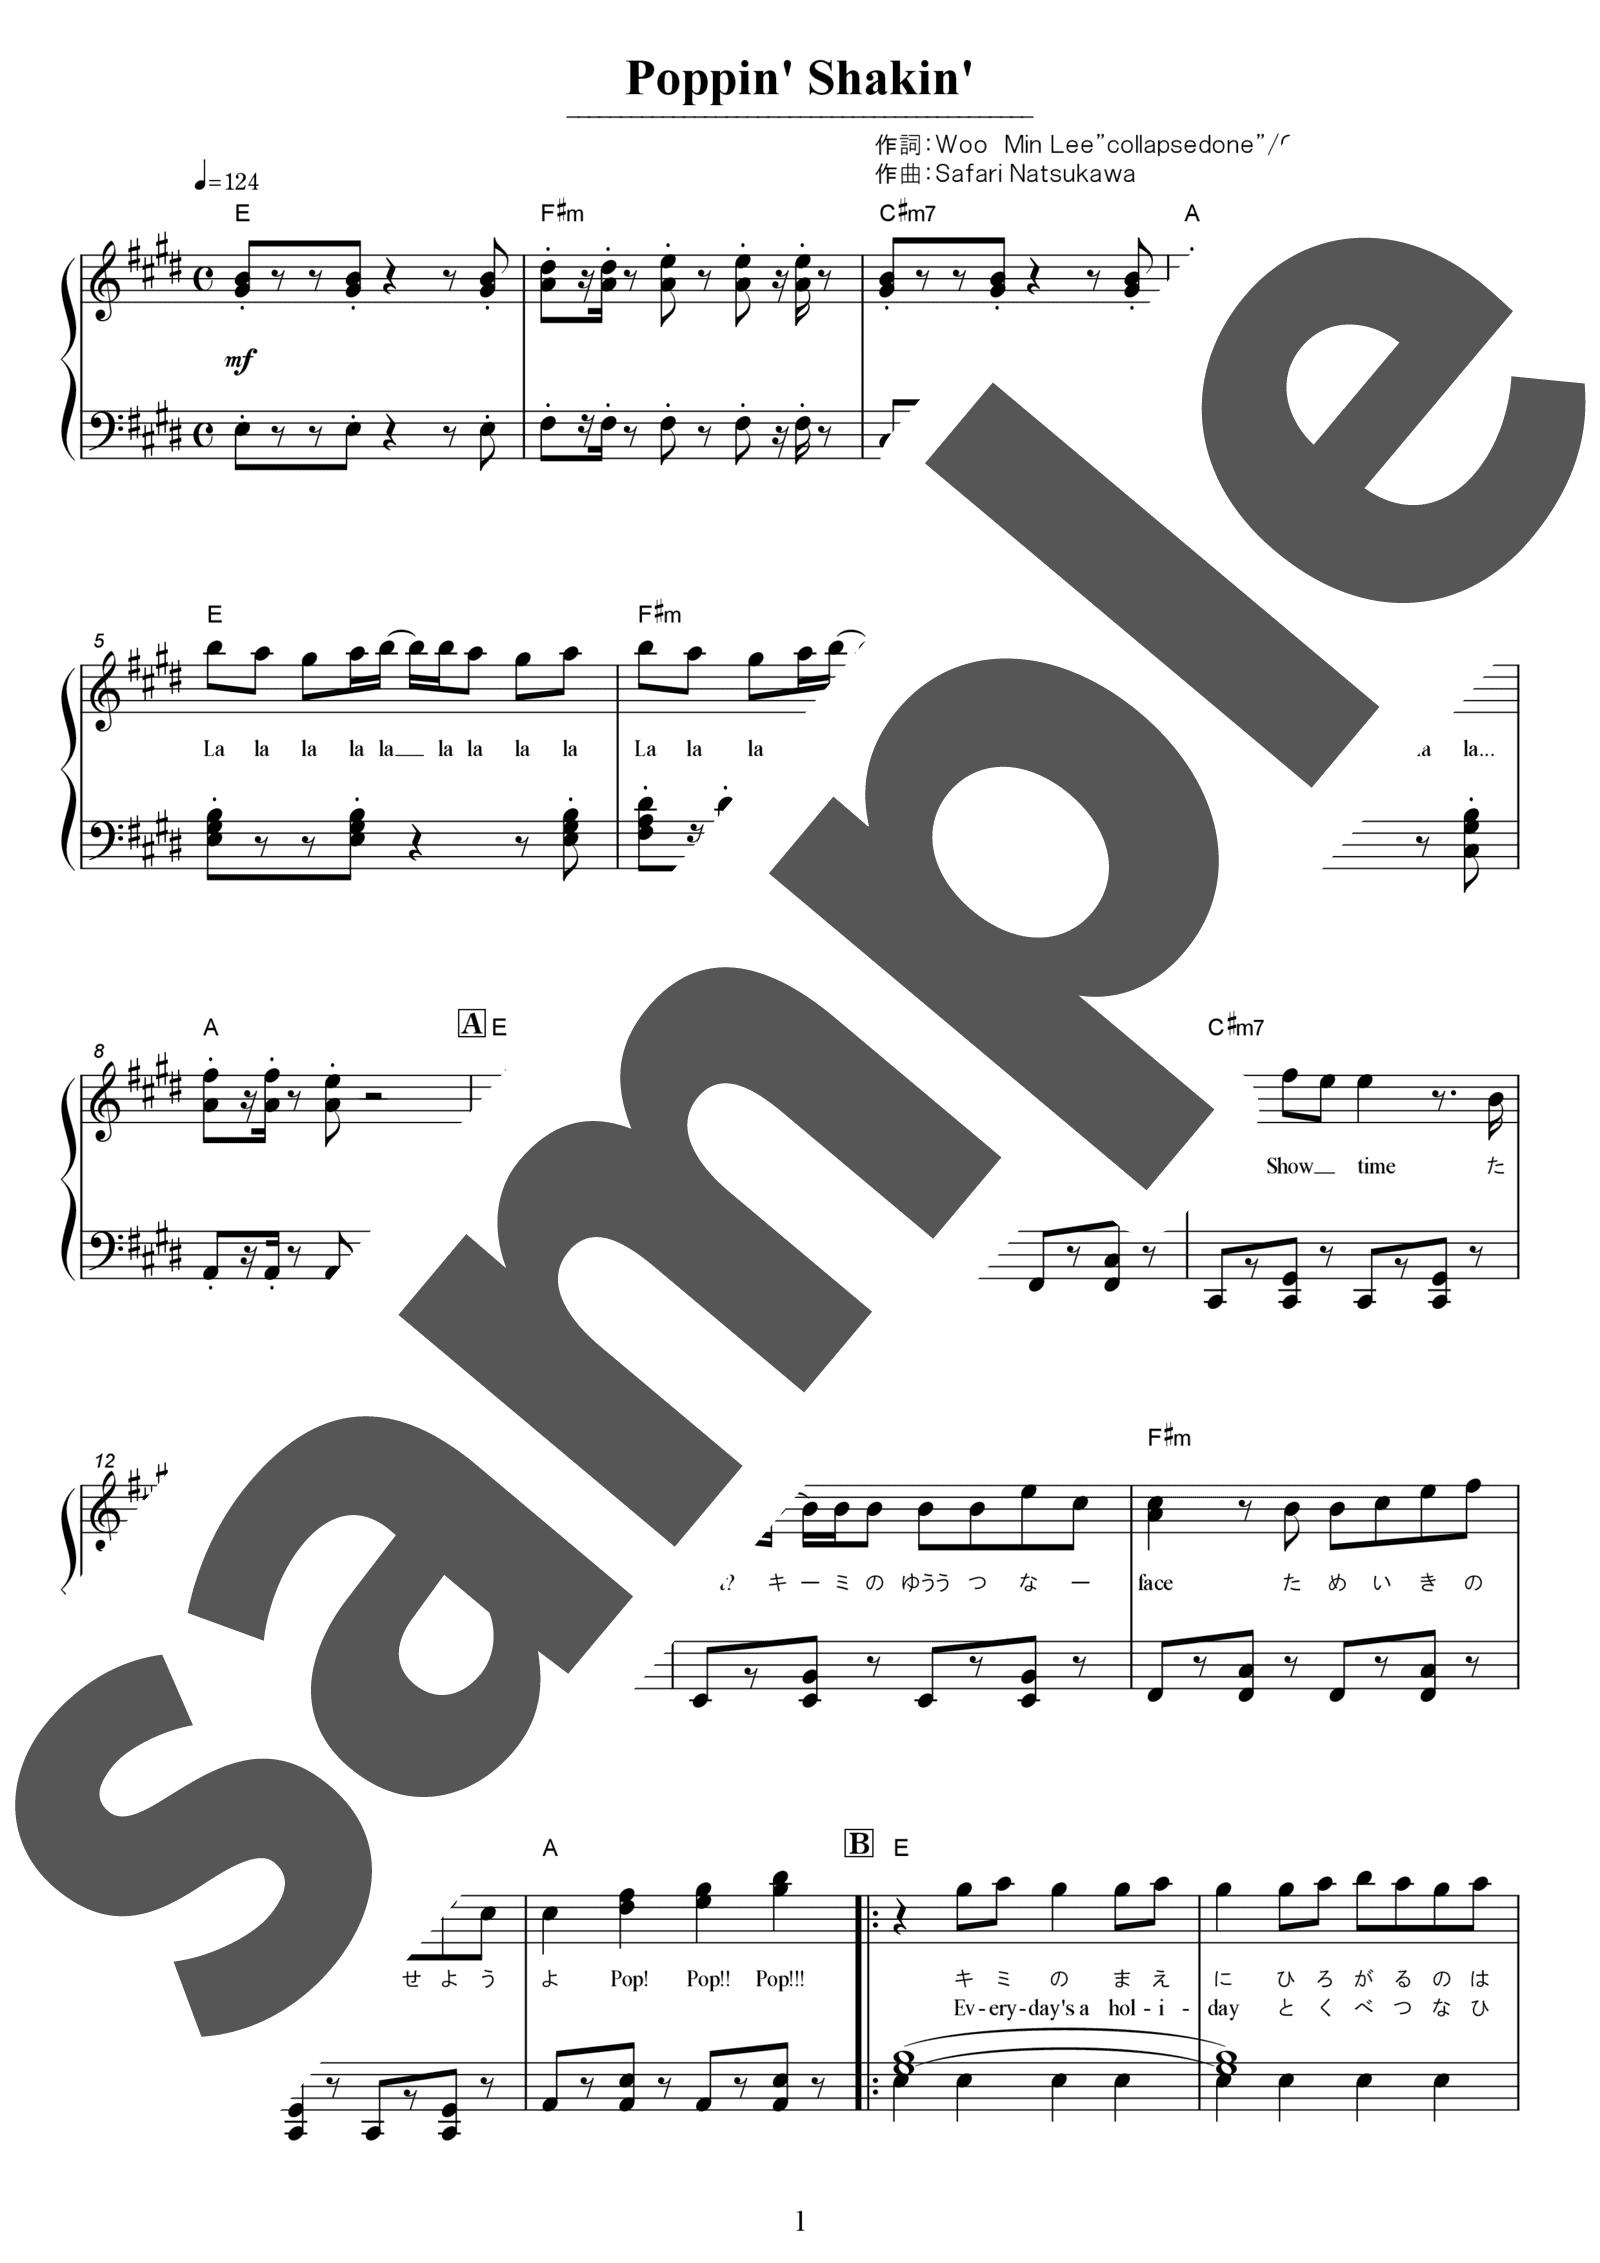 「Poppin' Shakin'」のサンプル楽譜